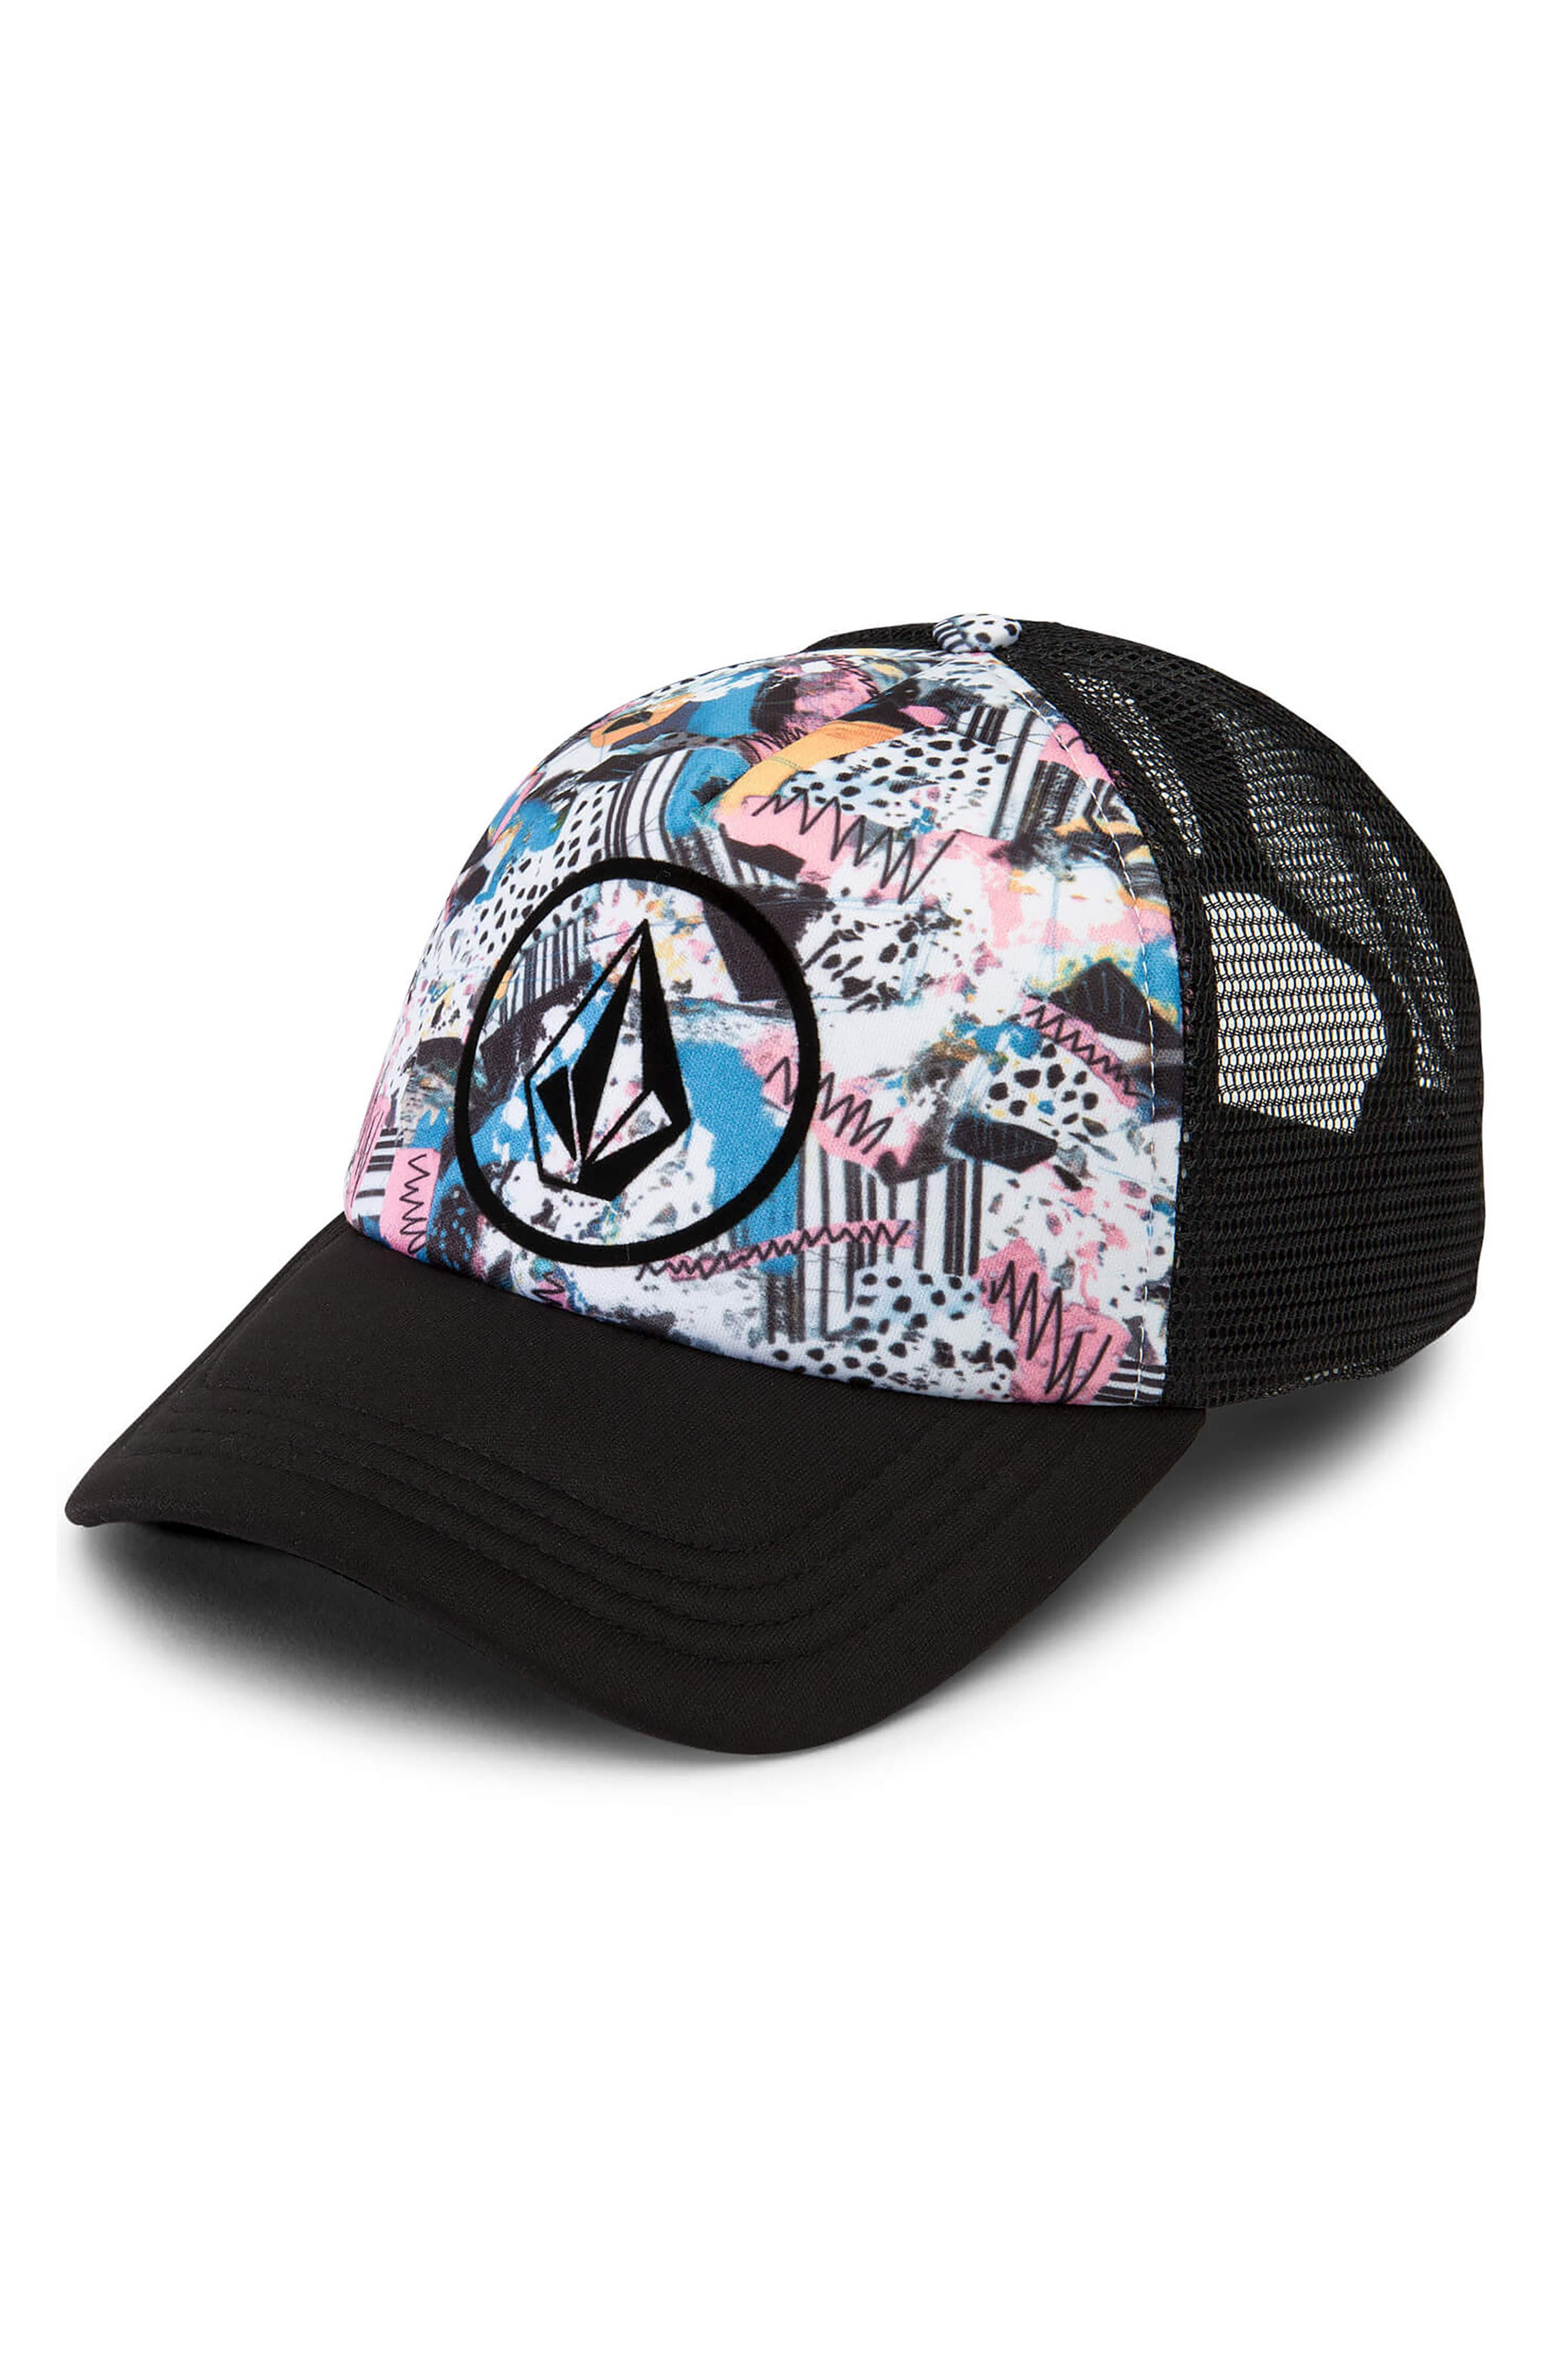 Tagurit Trucker Hat,                             Main thumbnail 1, color,                             001